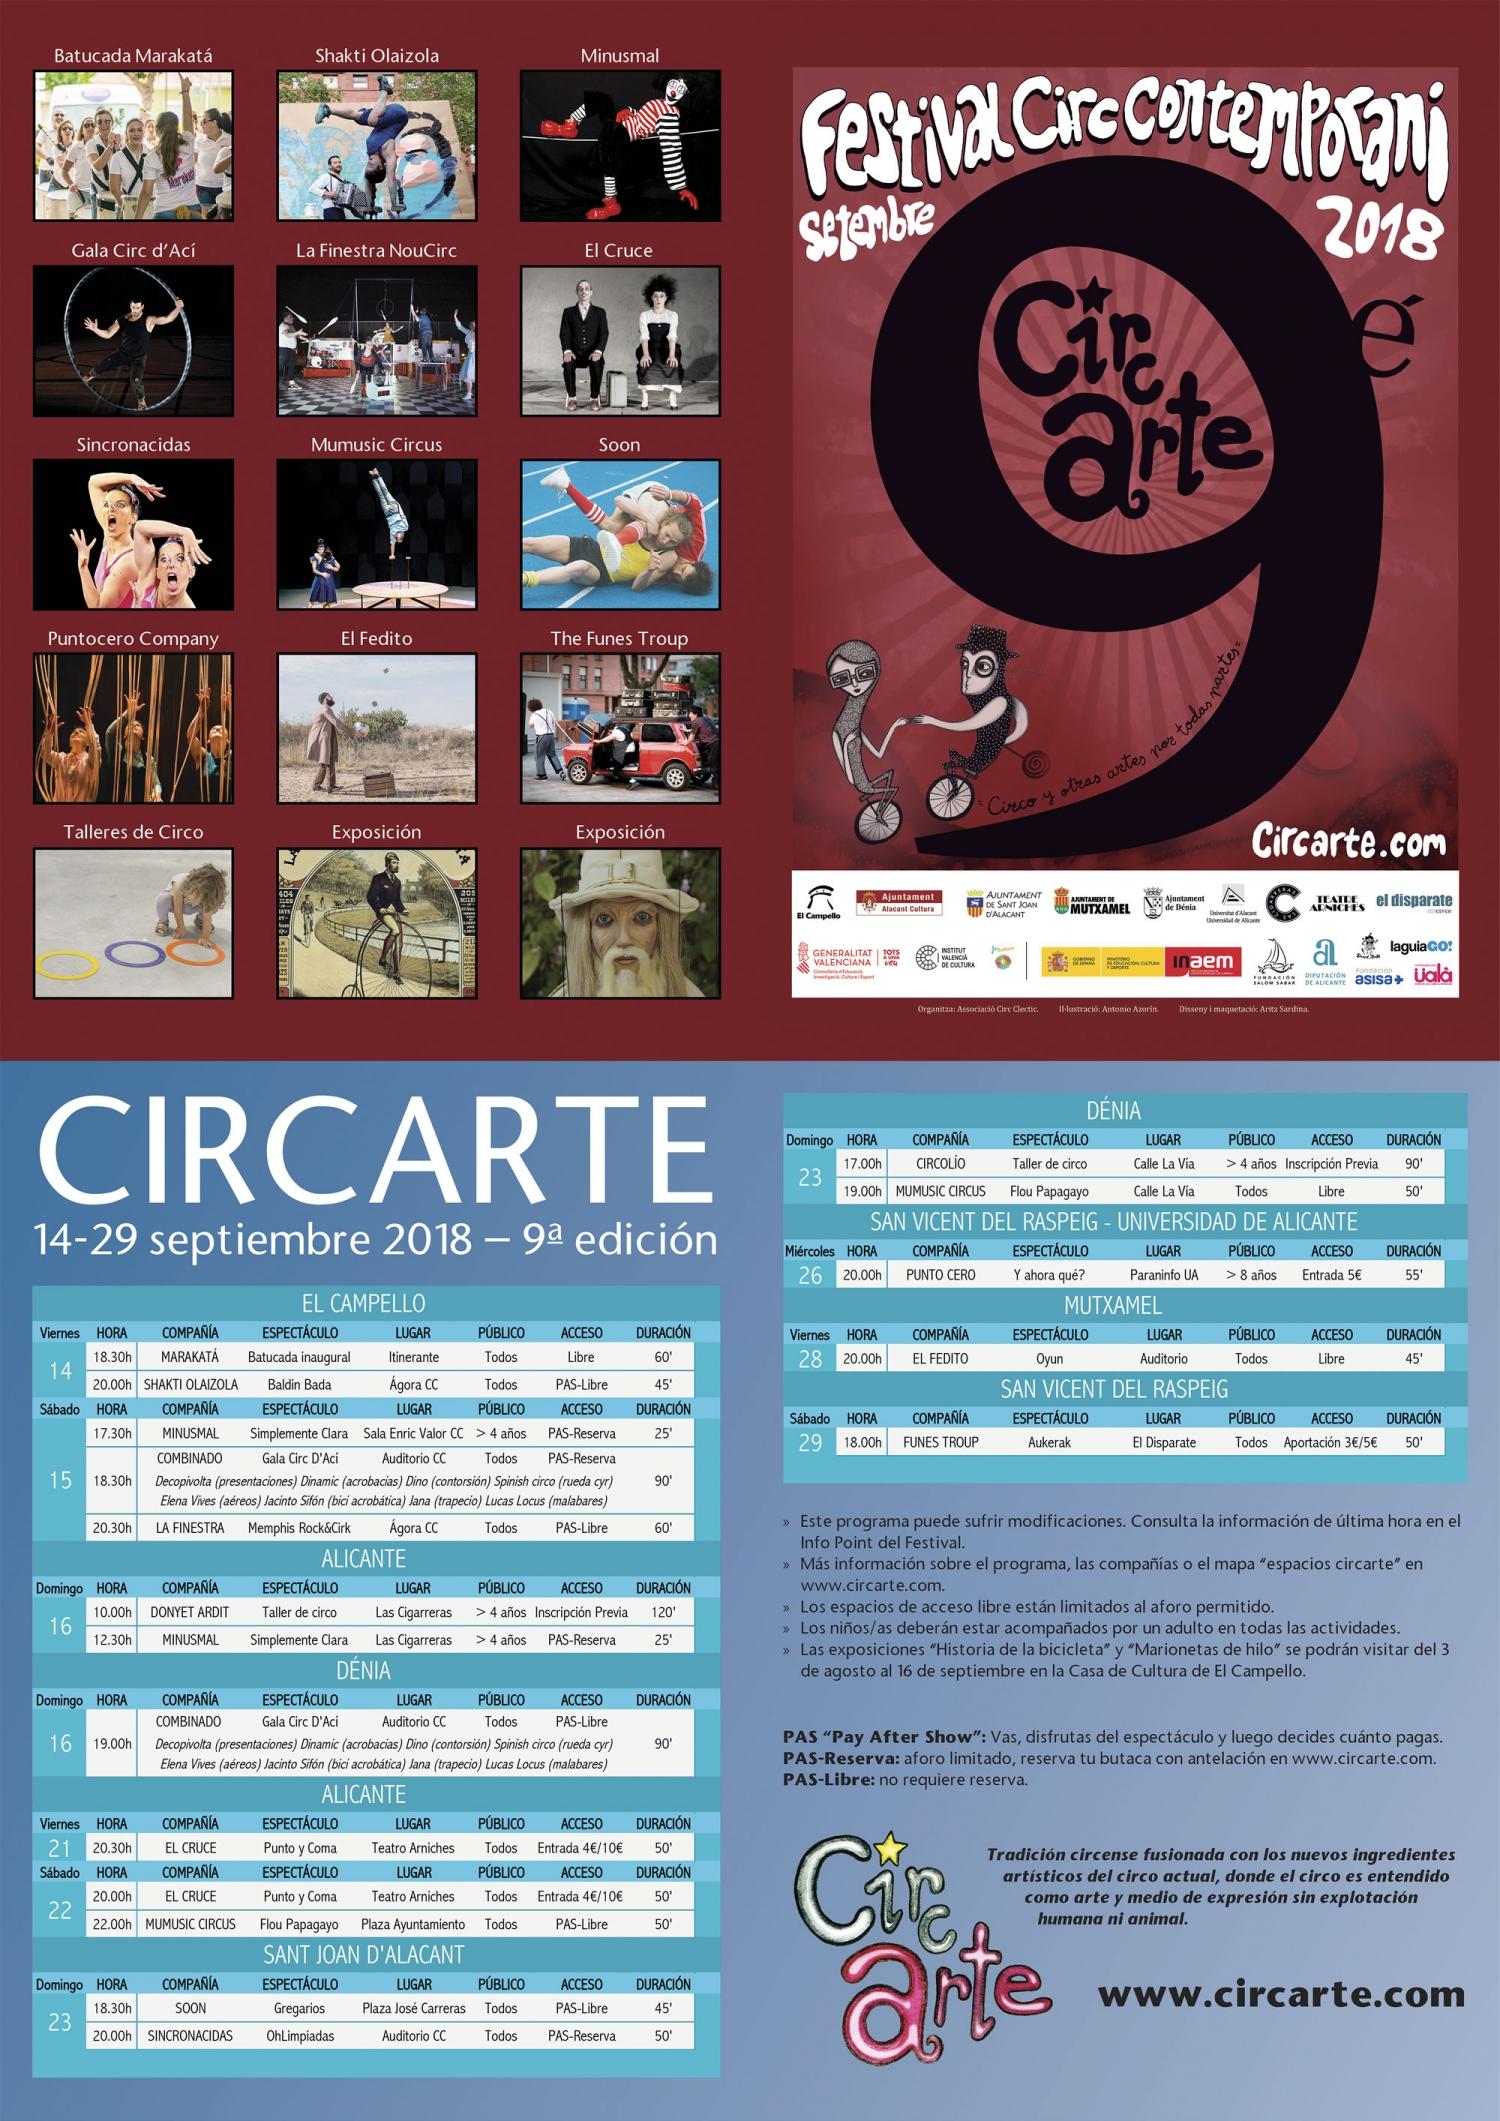 Circarte Contemporary Circus Festival in Alicante Province